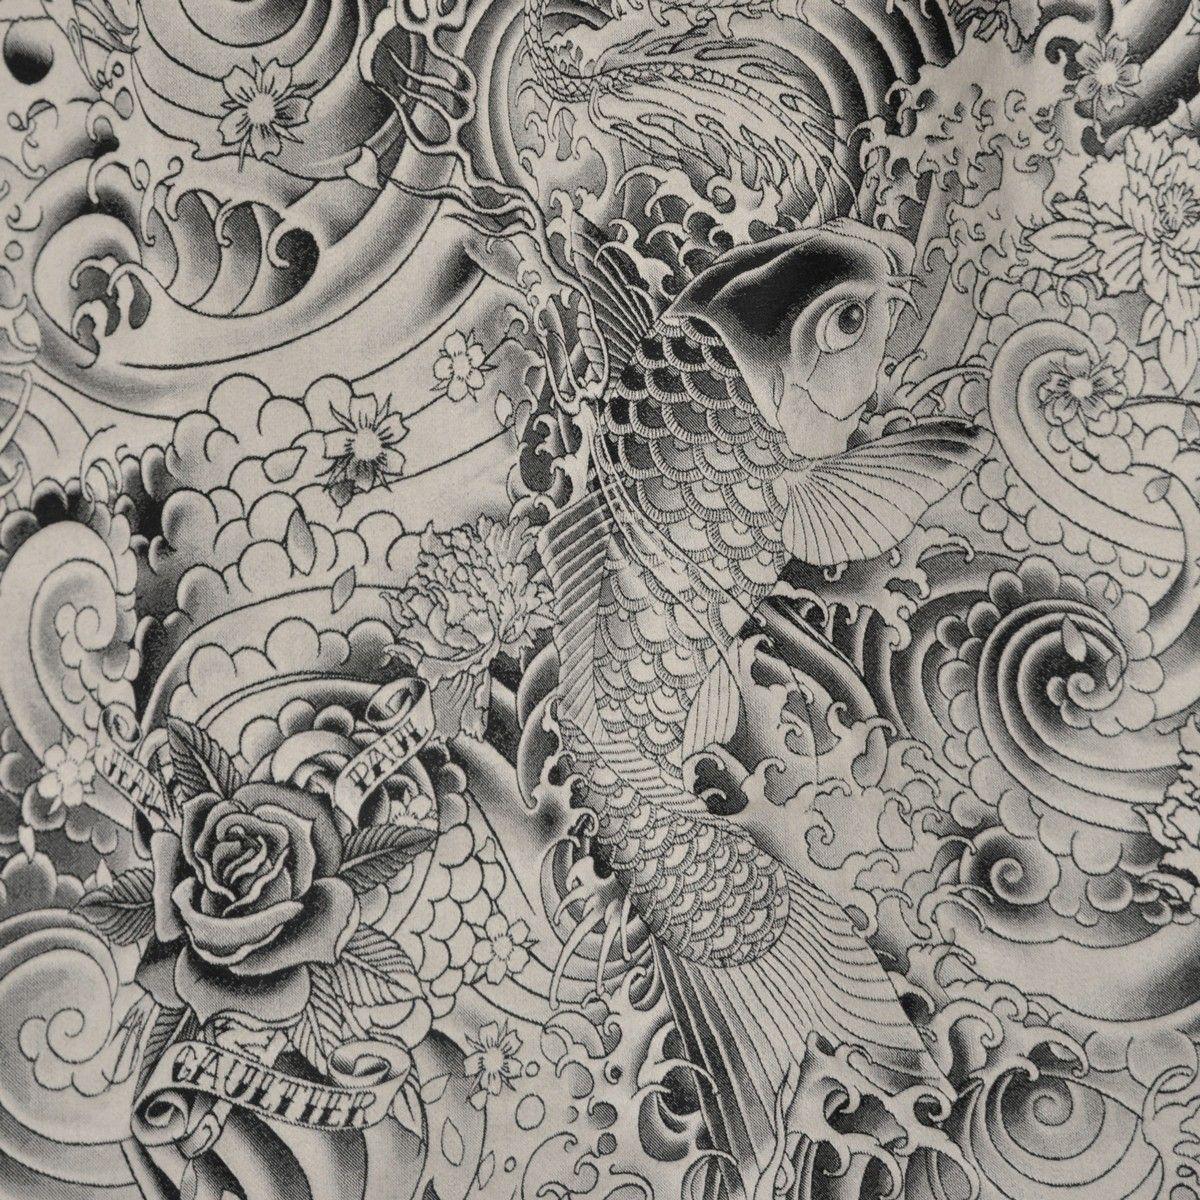 Tissu Jean Paul Gaultier tissu komodo - jean paul gaultier | jean paul gaultier